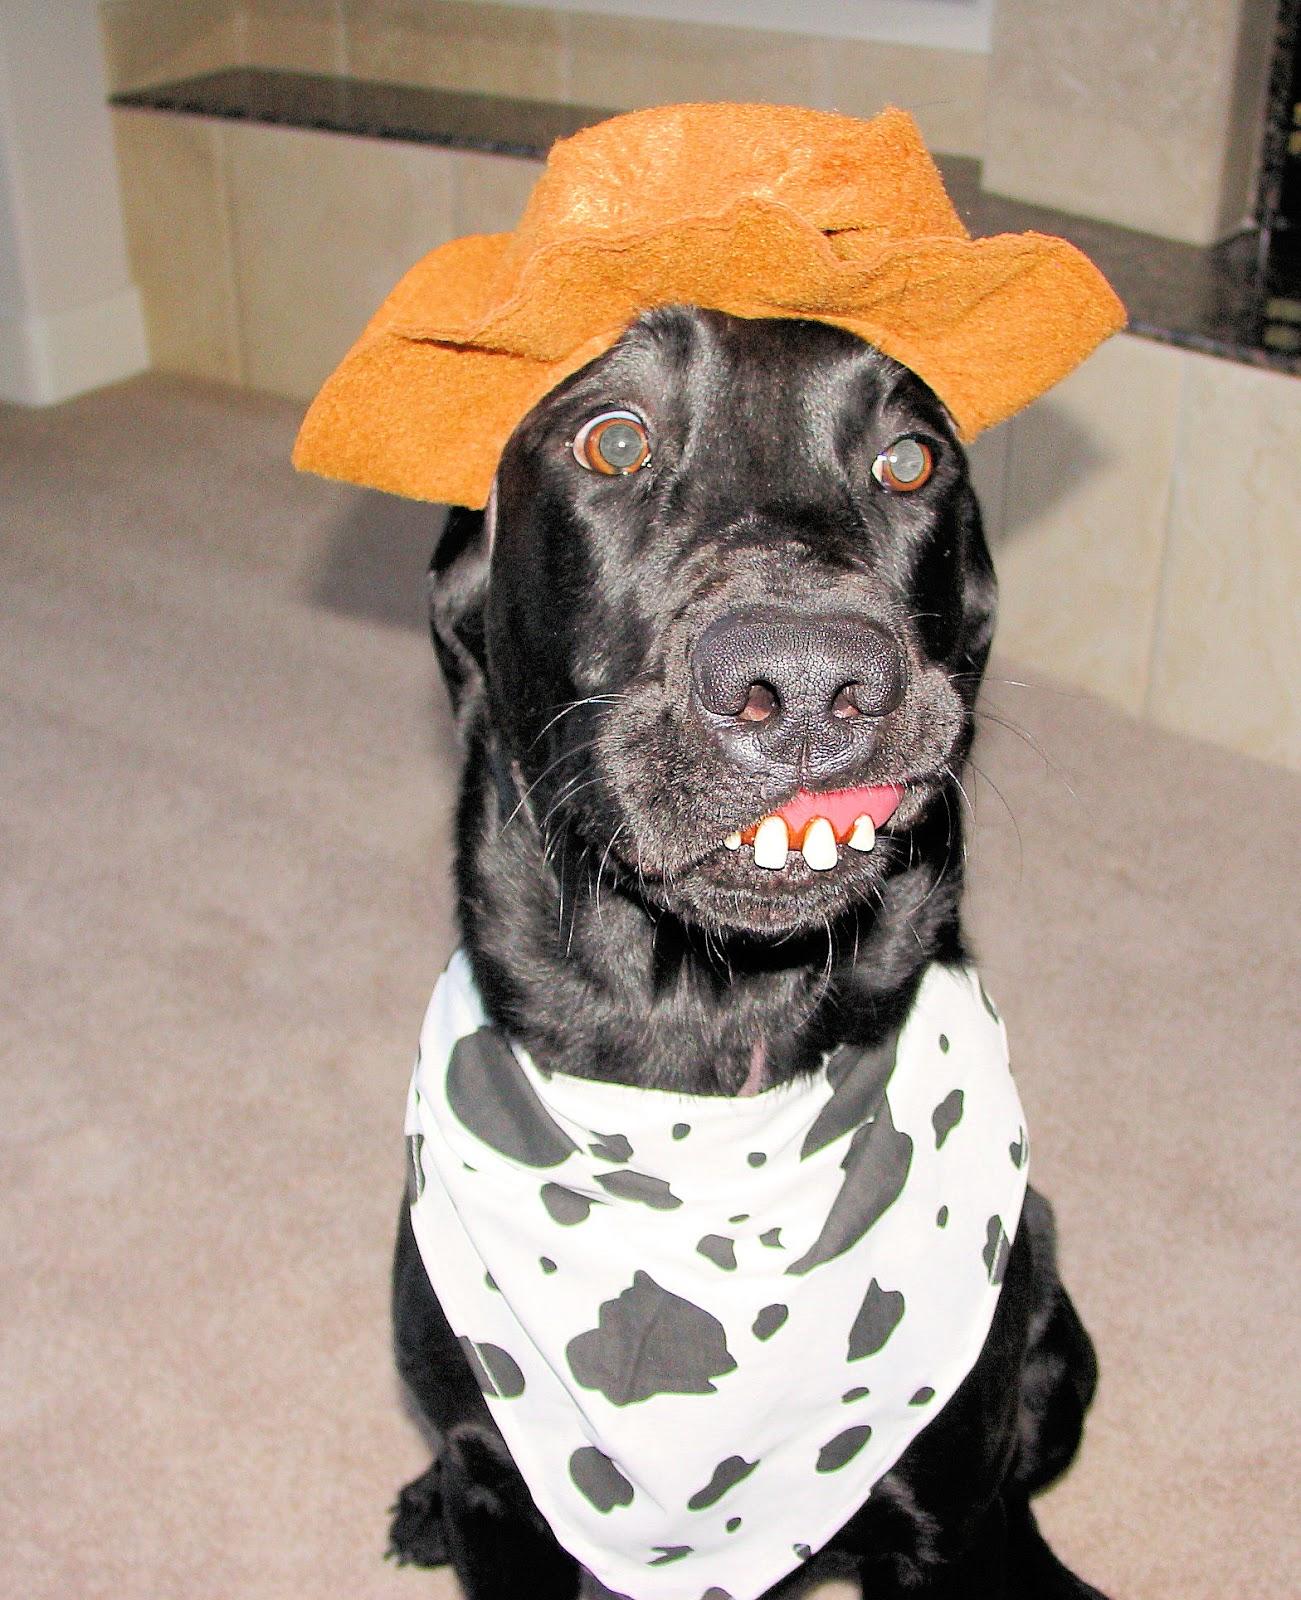 Dr. Debbie: Pet Halloween Costumes: Spook-tastic or Just Crazy?